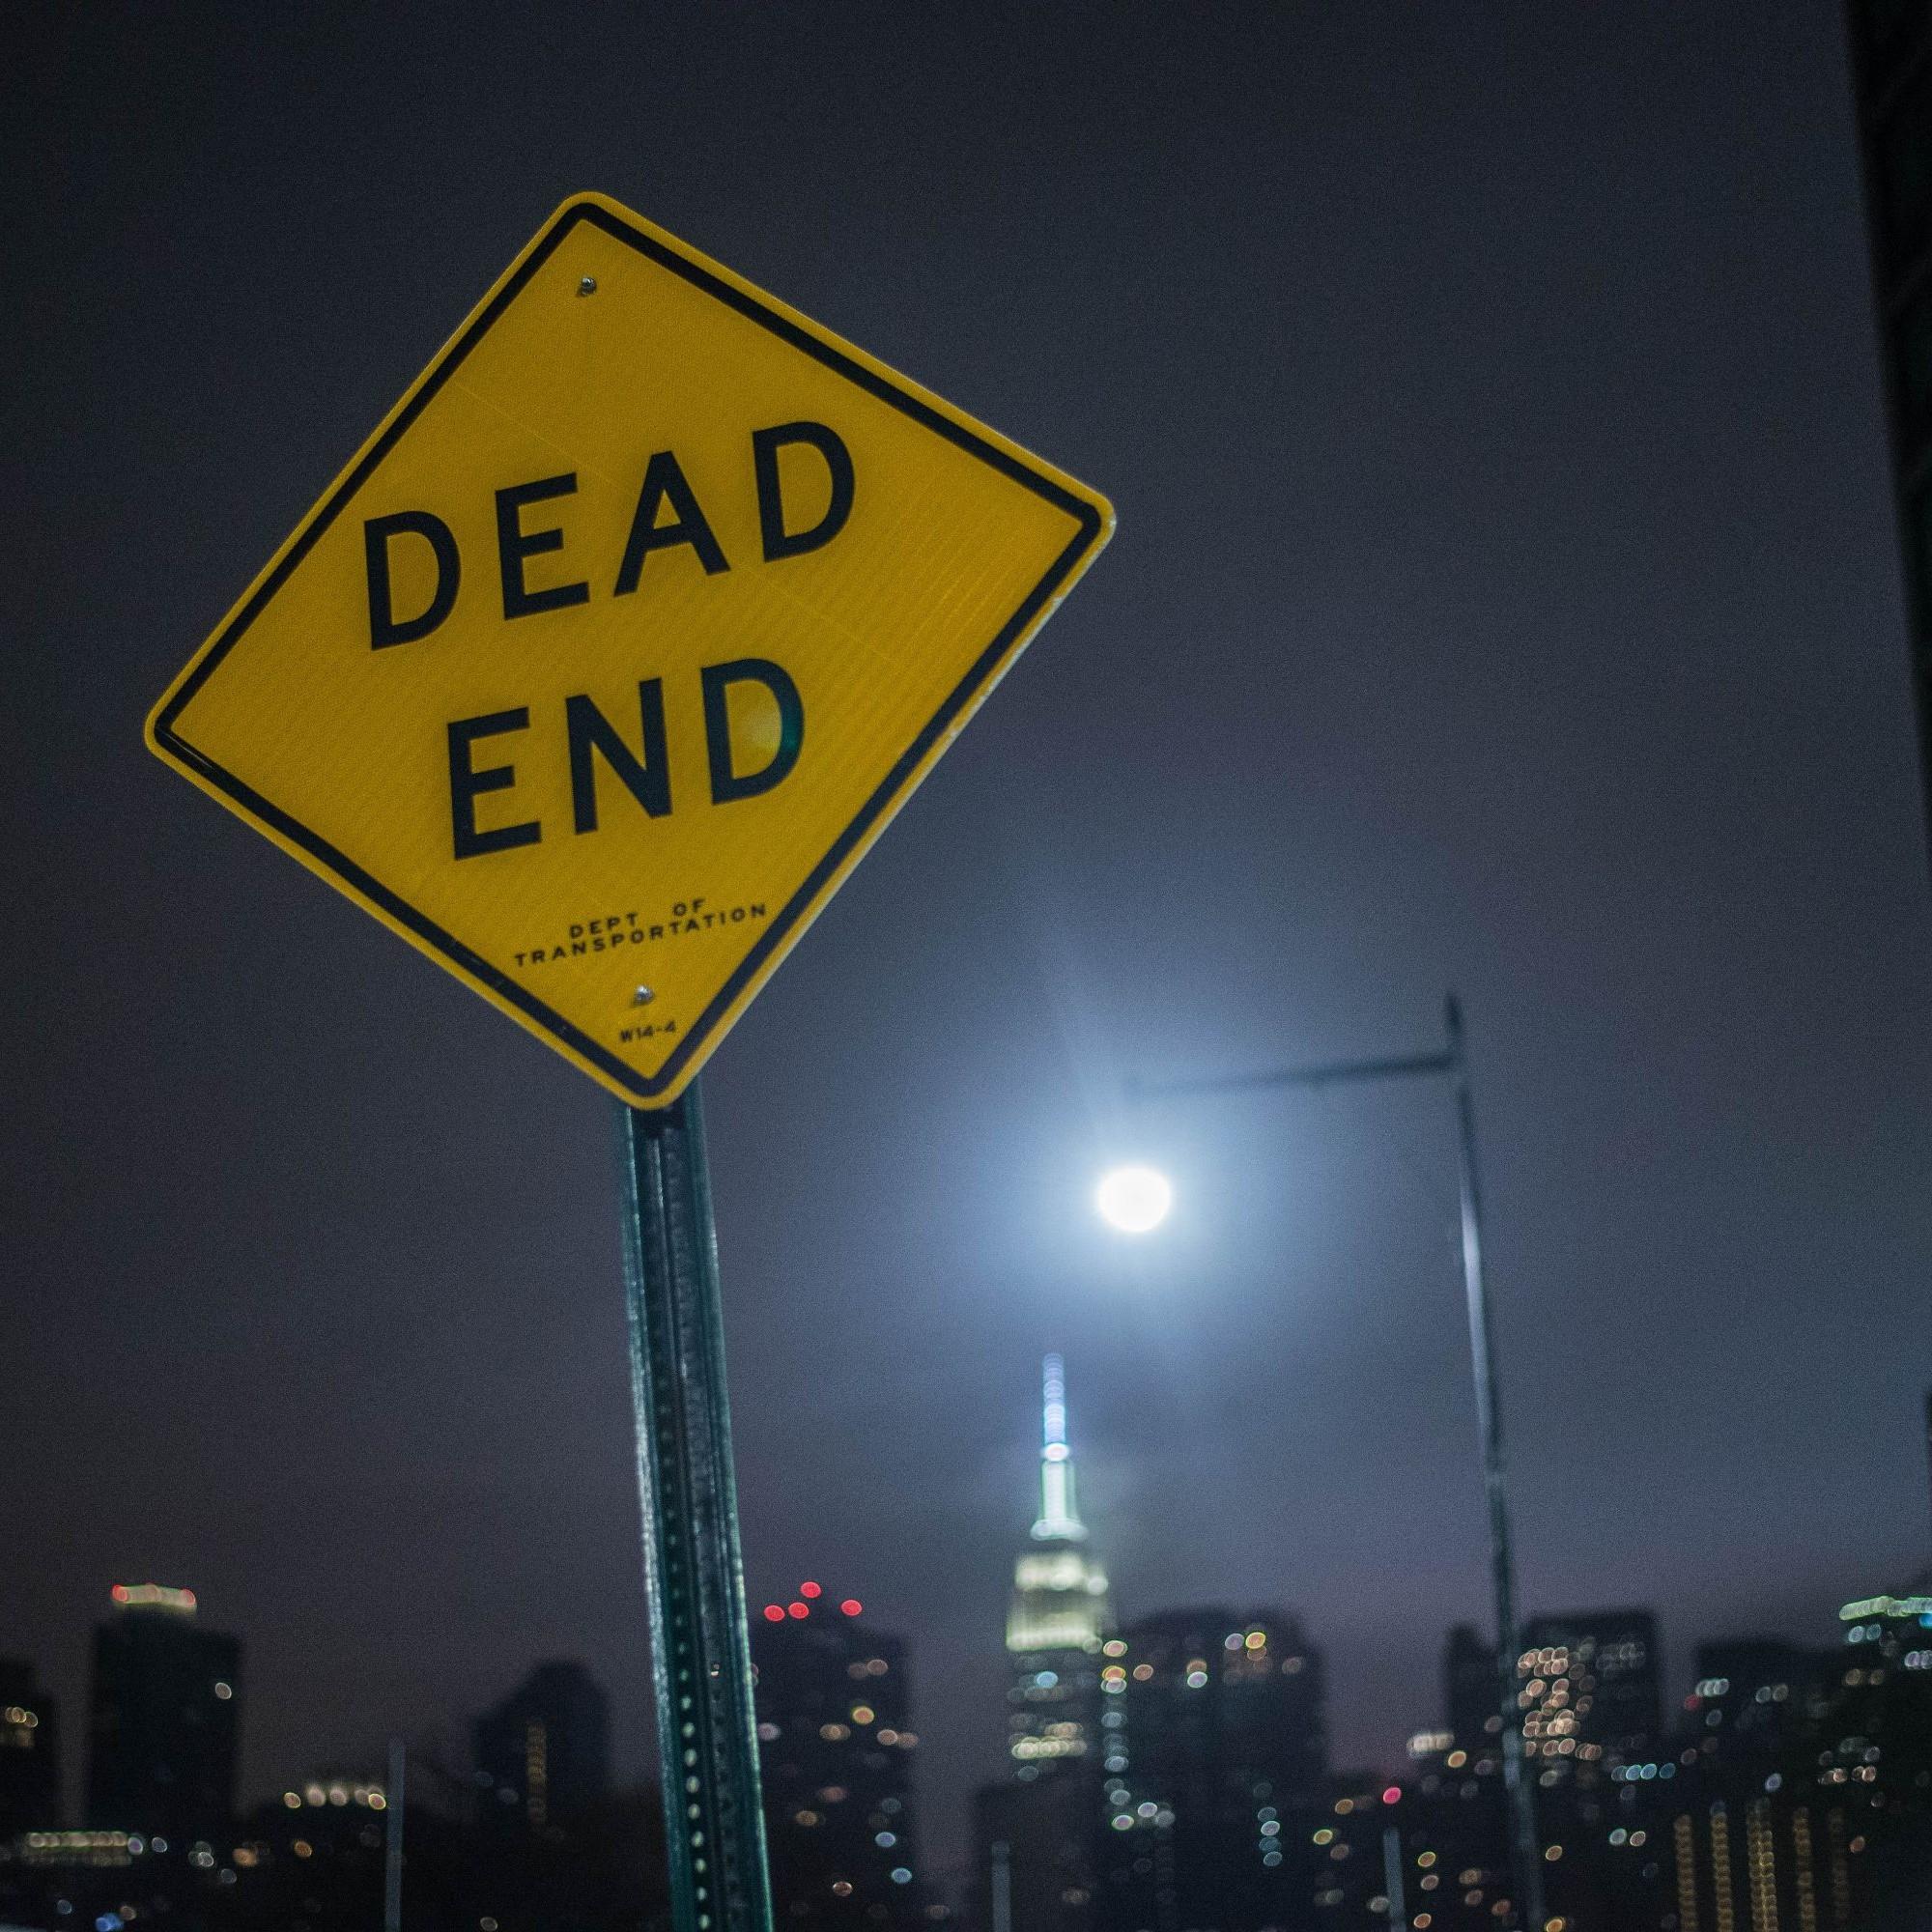 Dead-End-Strassentafel